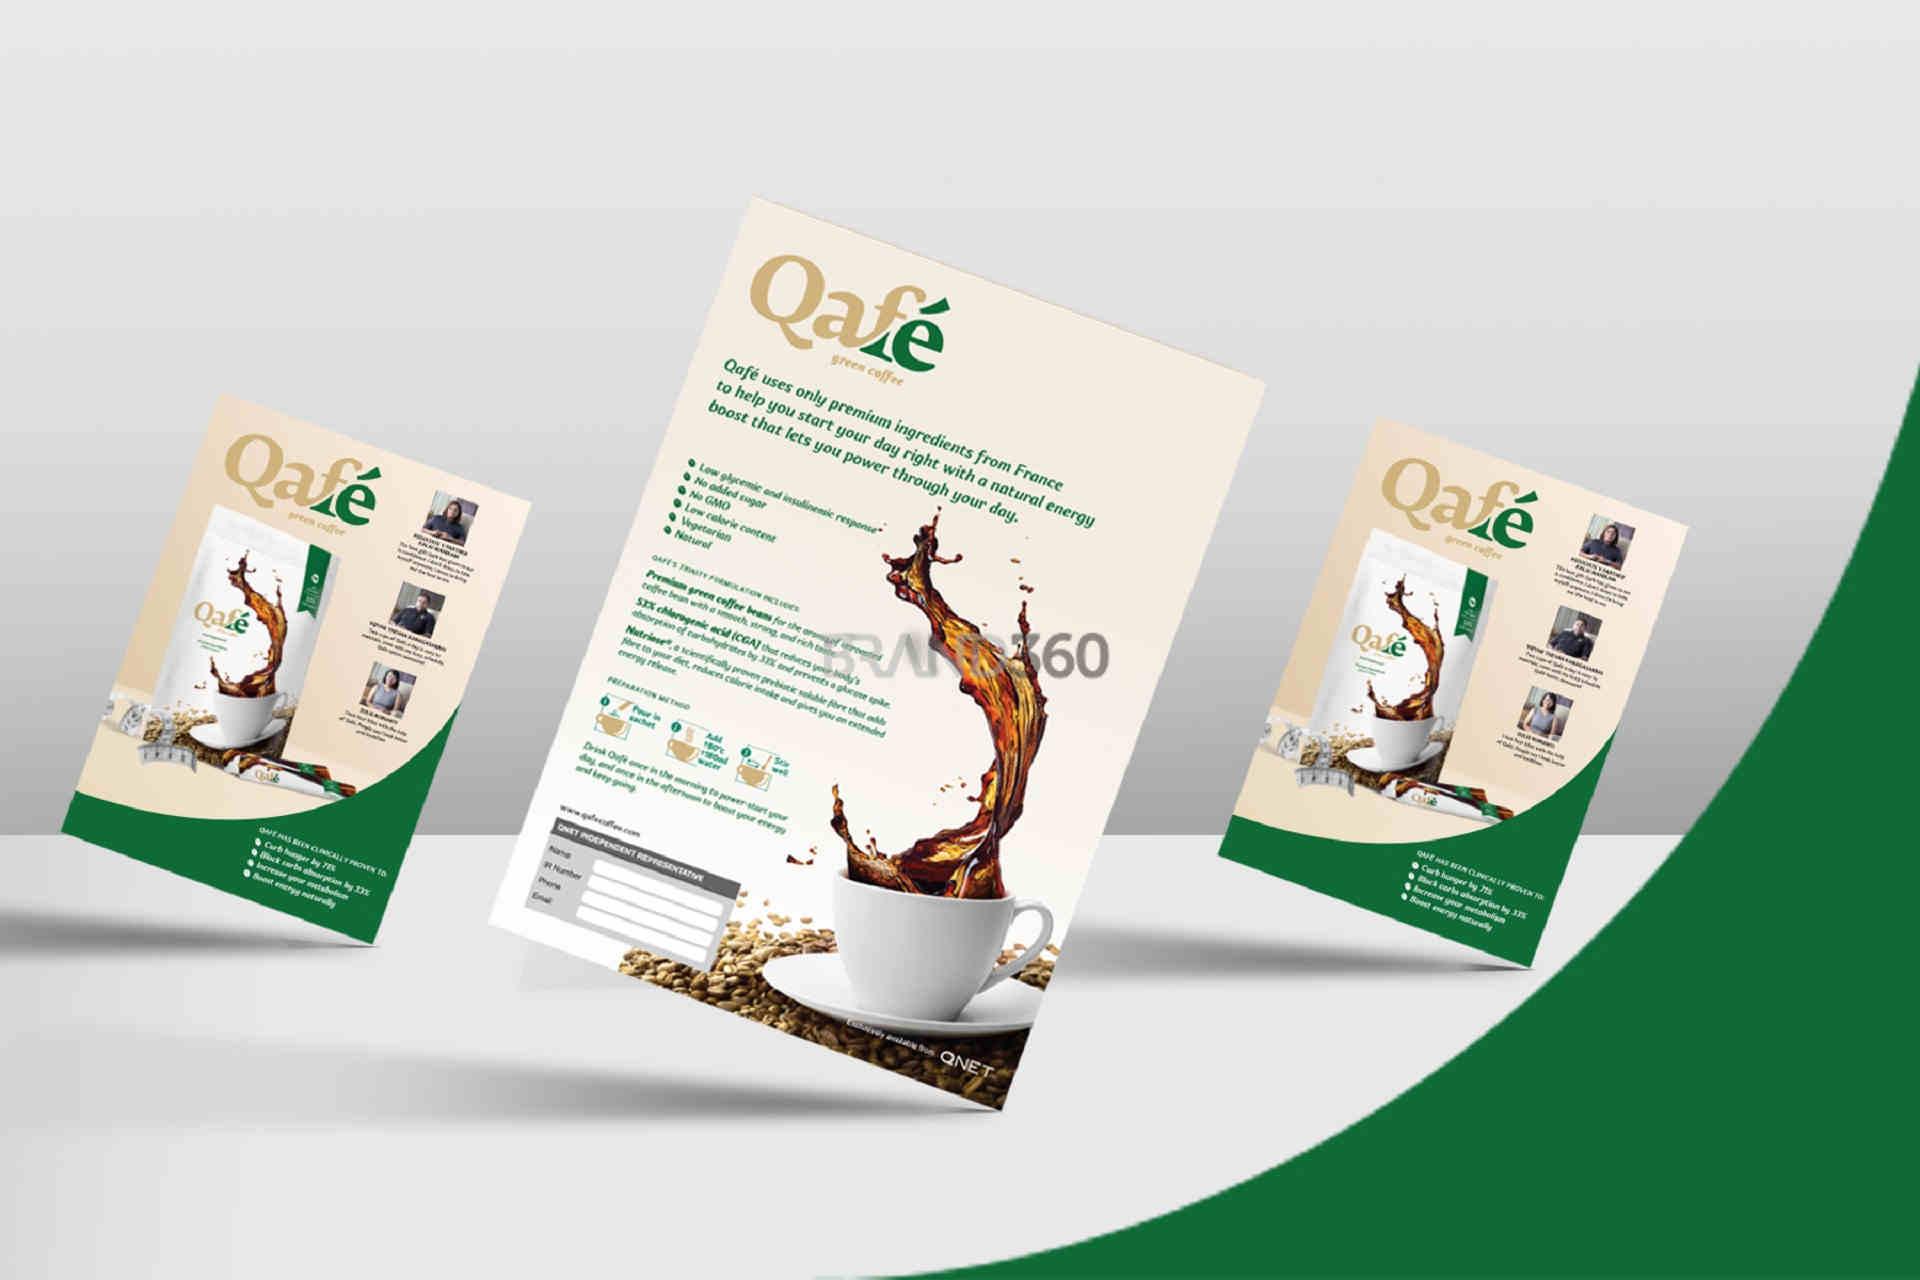 Qafe-Blitzcard